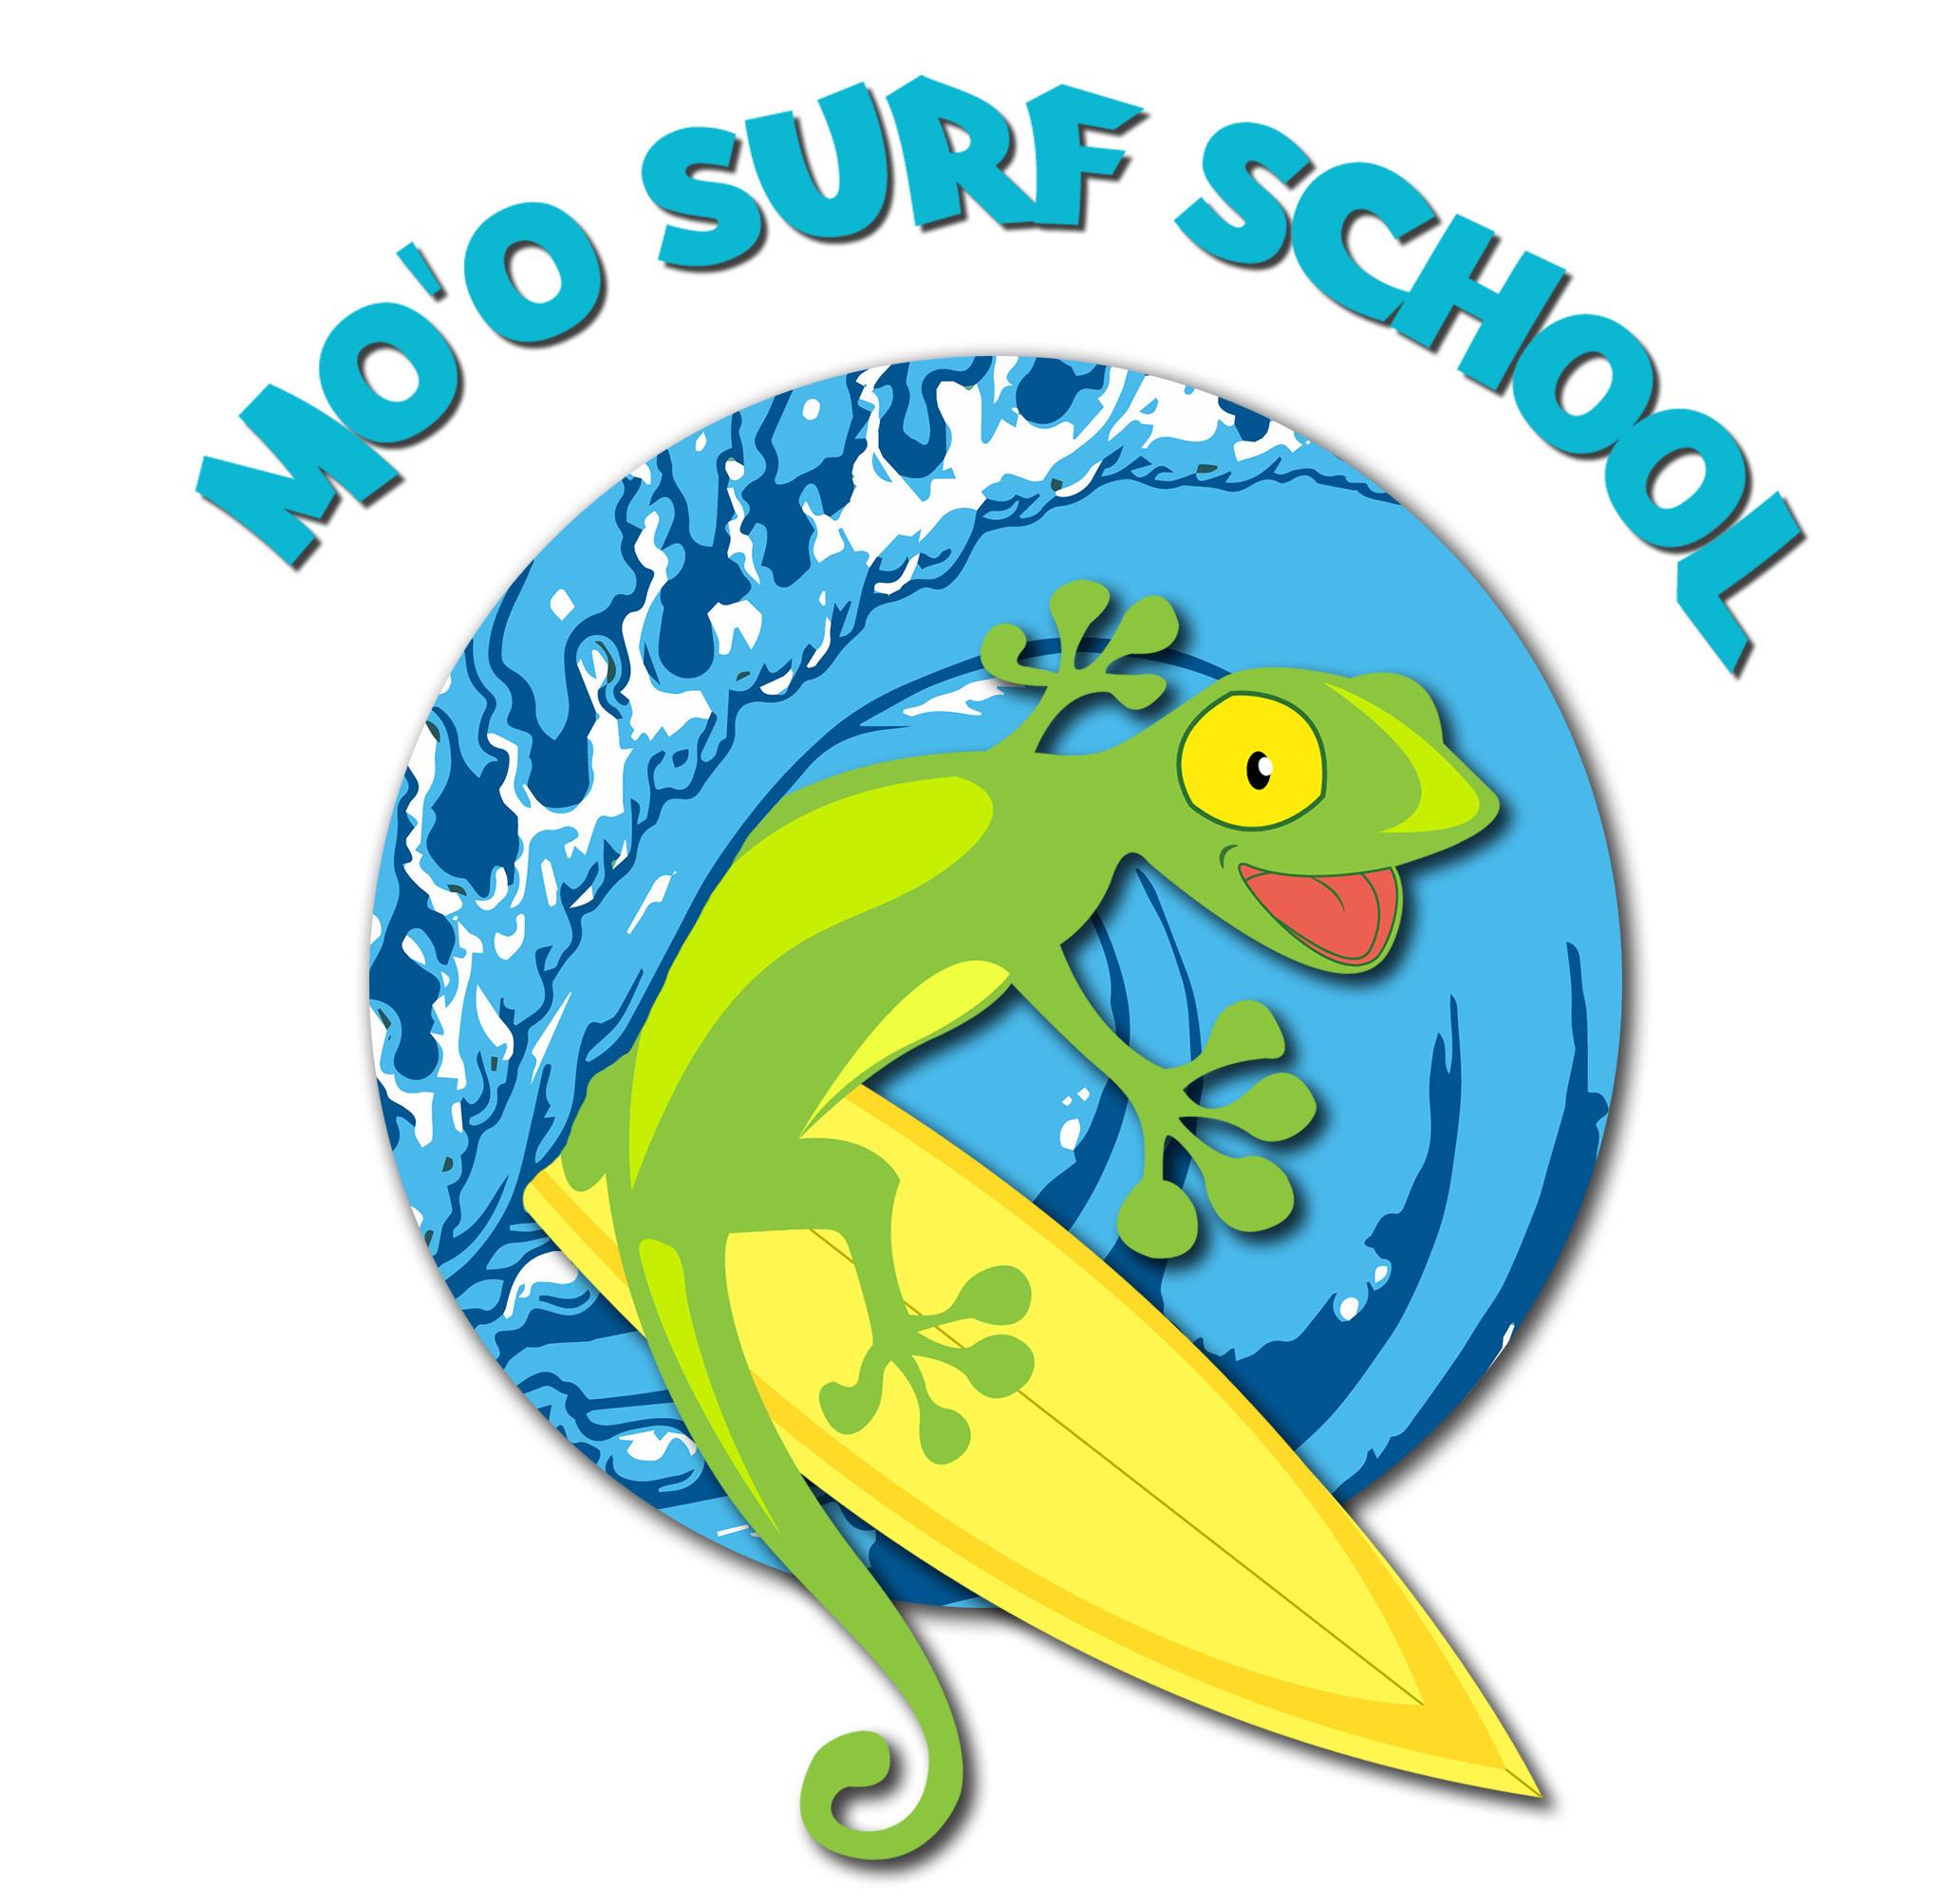 http://www.tahiti-infos.com/agenda/STAGE-DE-SURF_ae506290.html